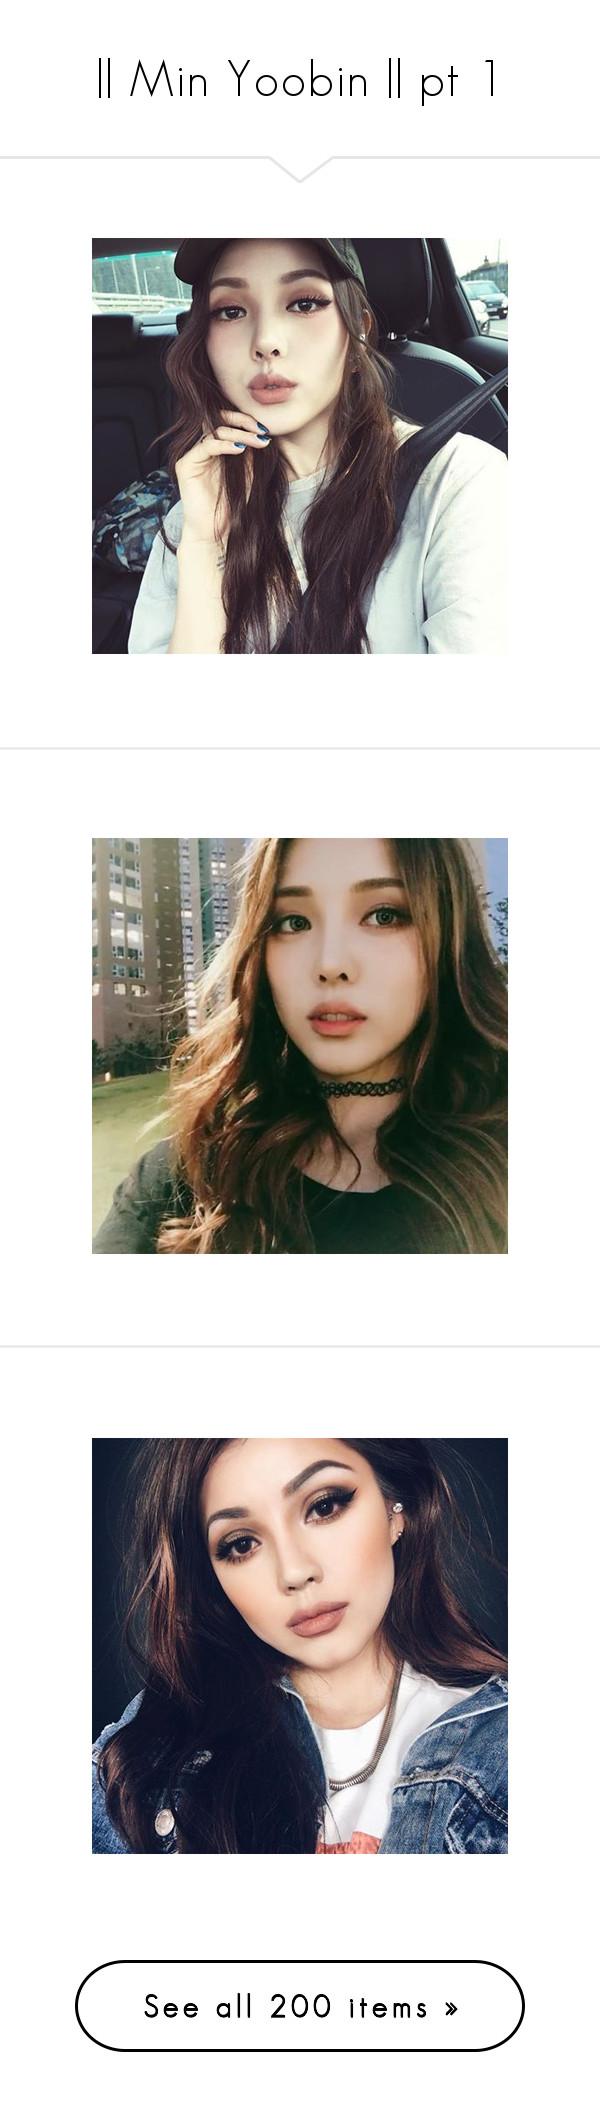 """|| Min Yoobin || pt 1"" by min-yoobin ❤ liked on Polyvore"